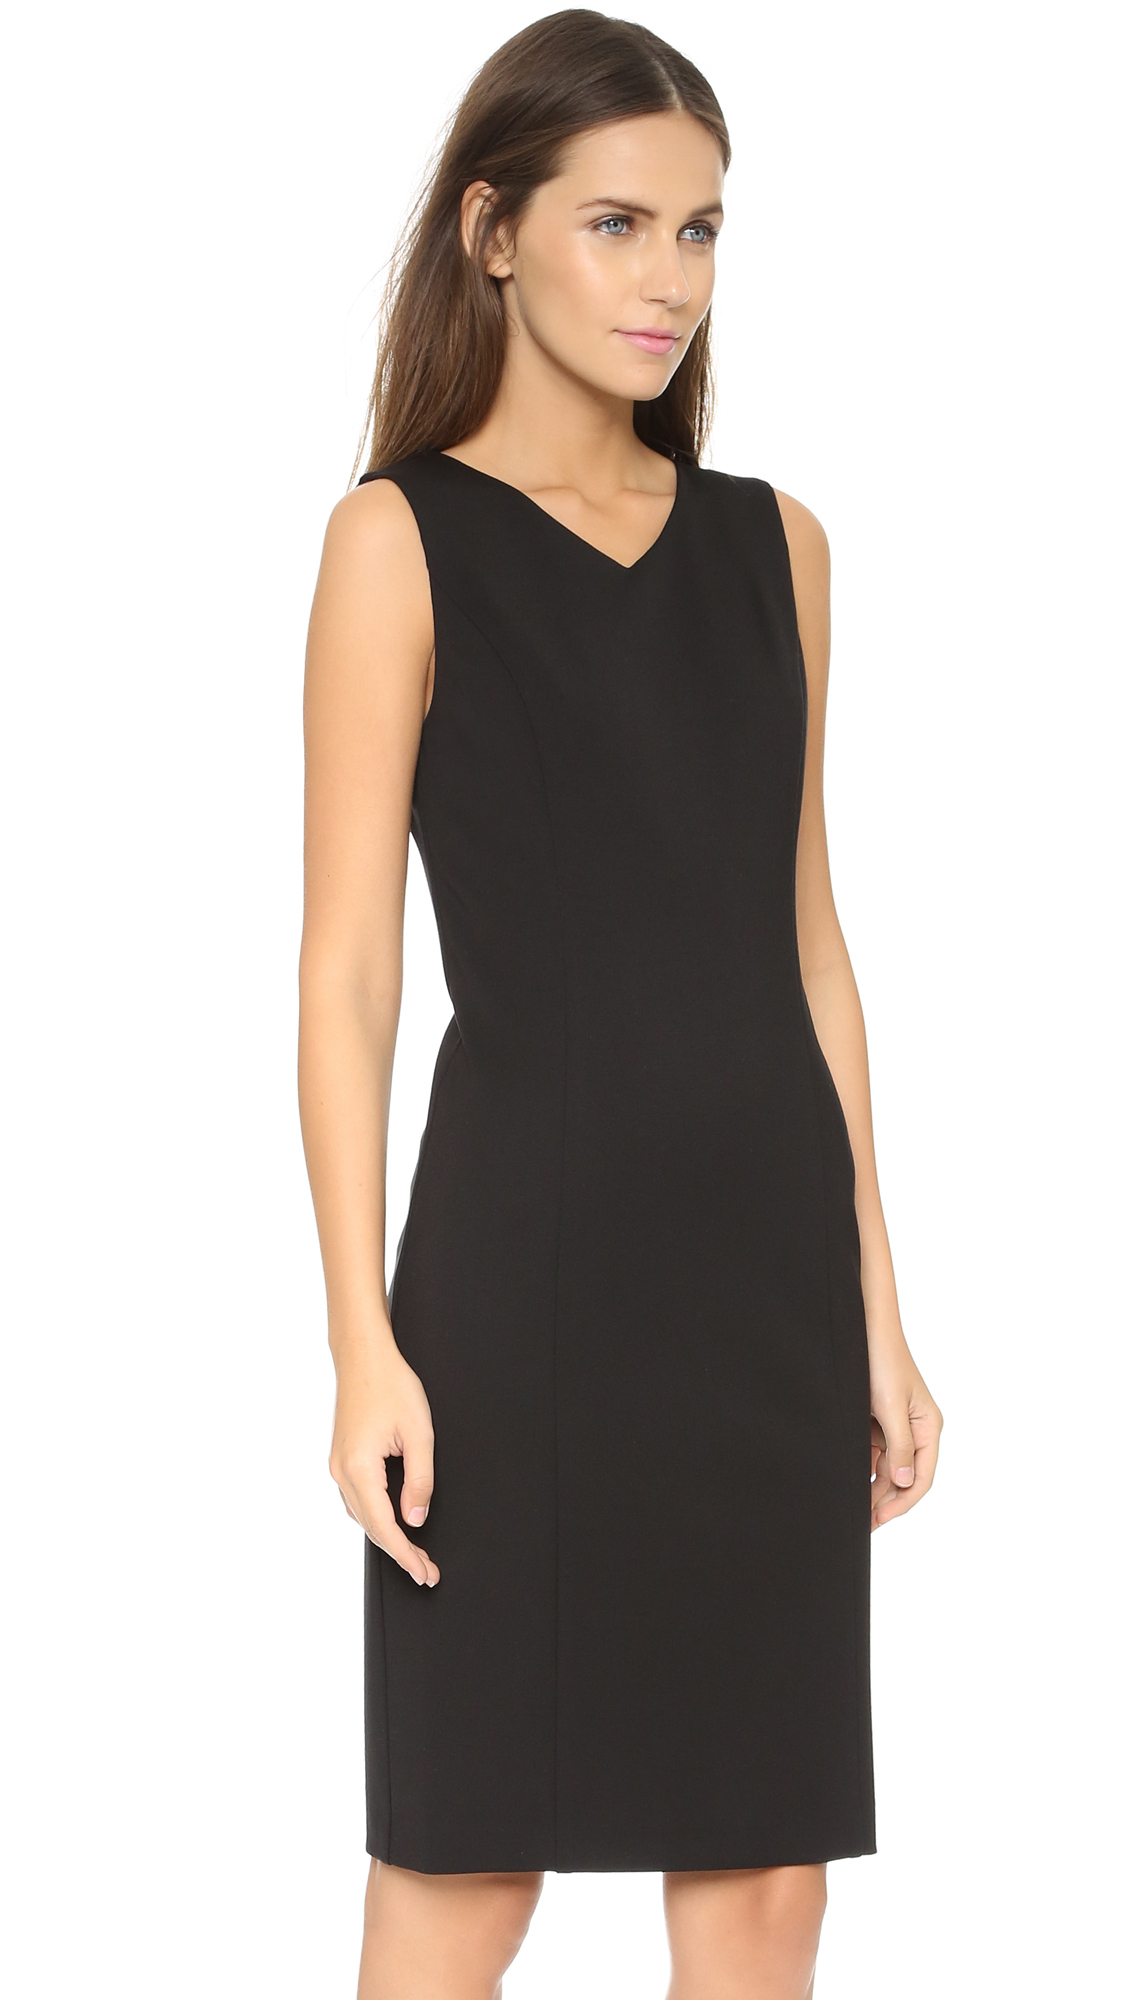 62ceba21 Rebecca Taylor V Neck Ponte Sheath Dress - Black in Black - Lyst